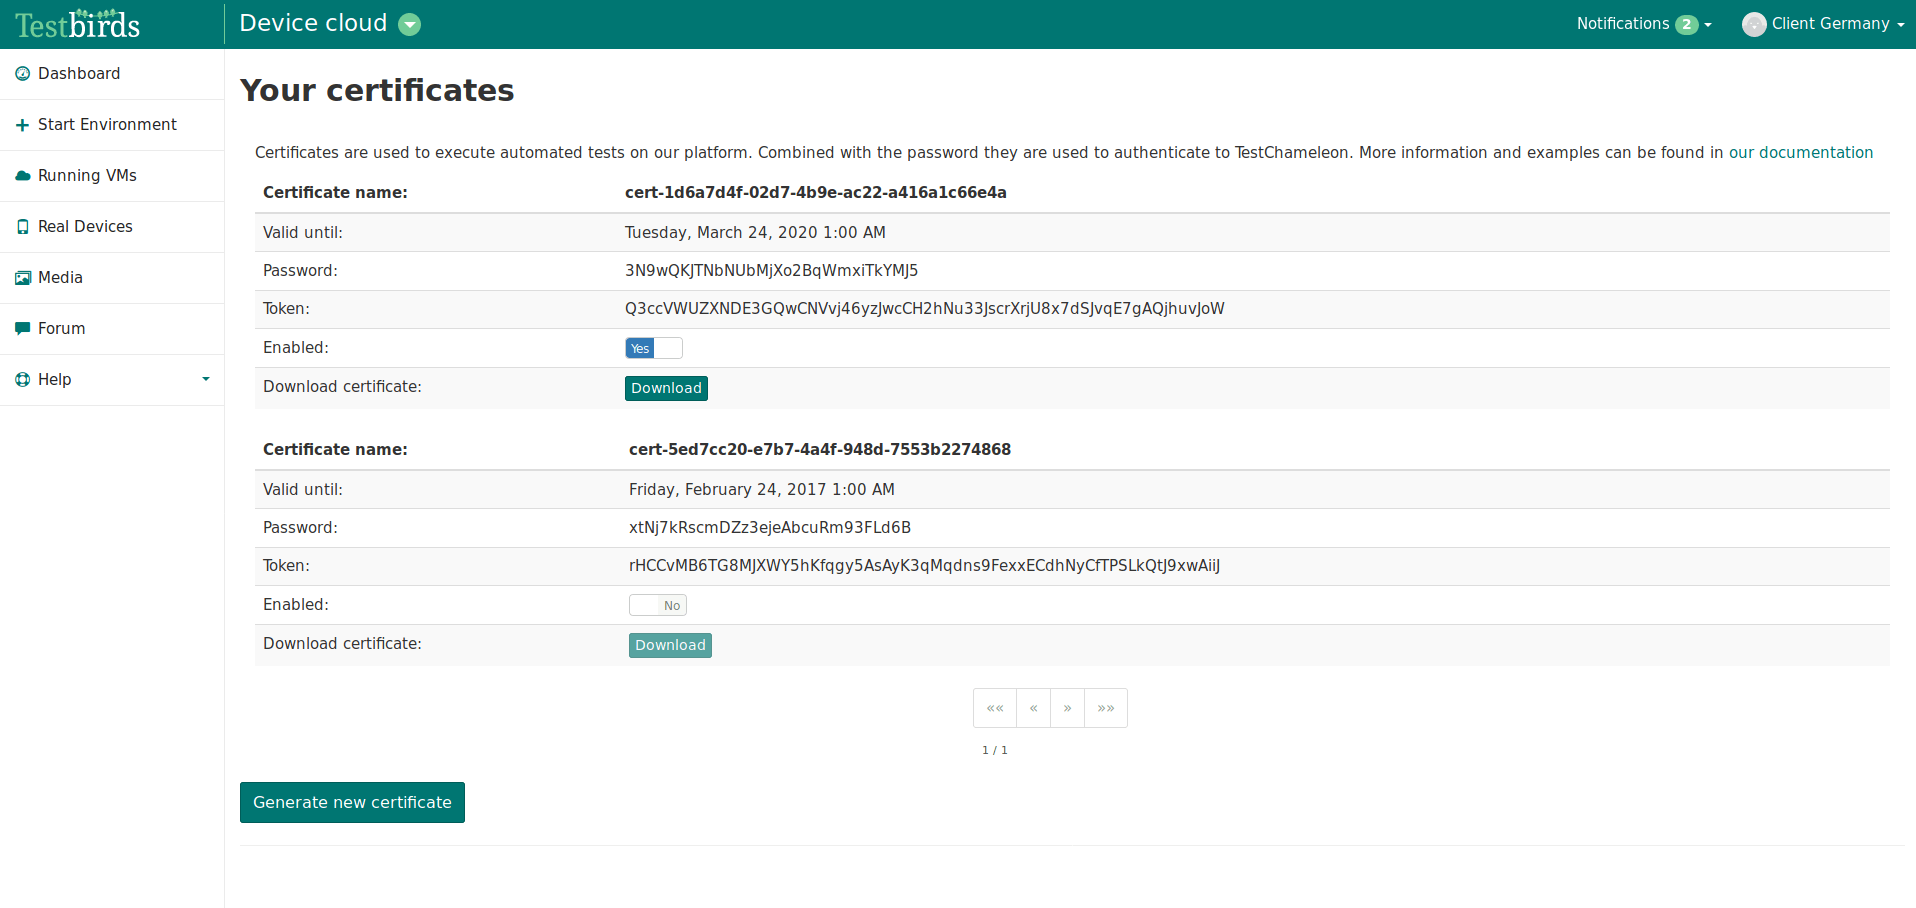 nest_device_cloud_certificates_view